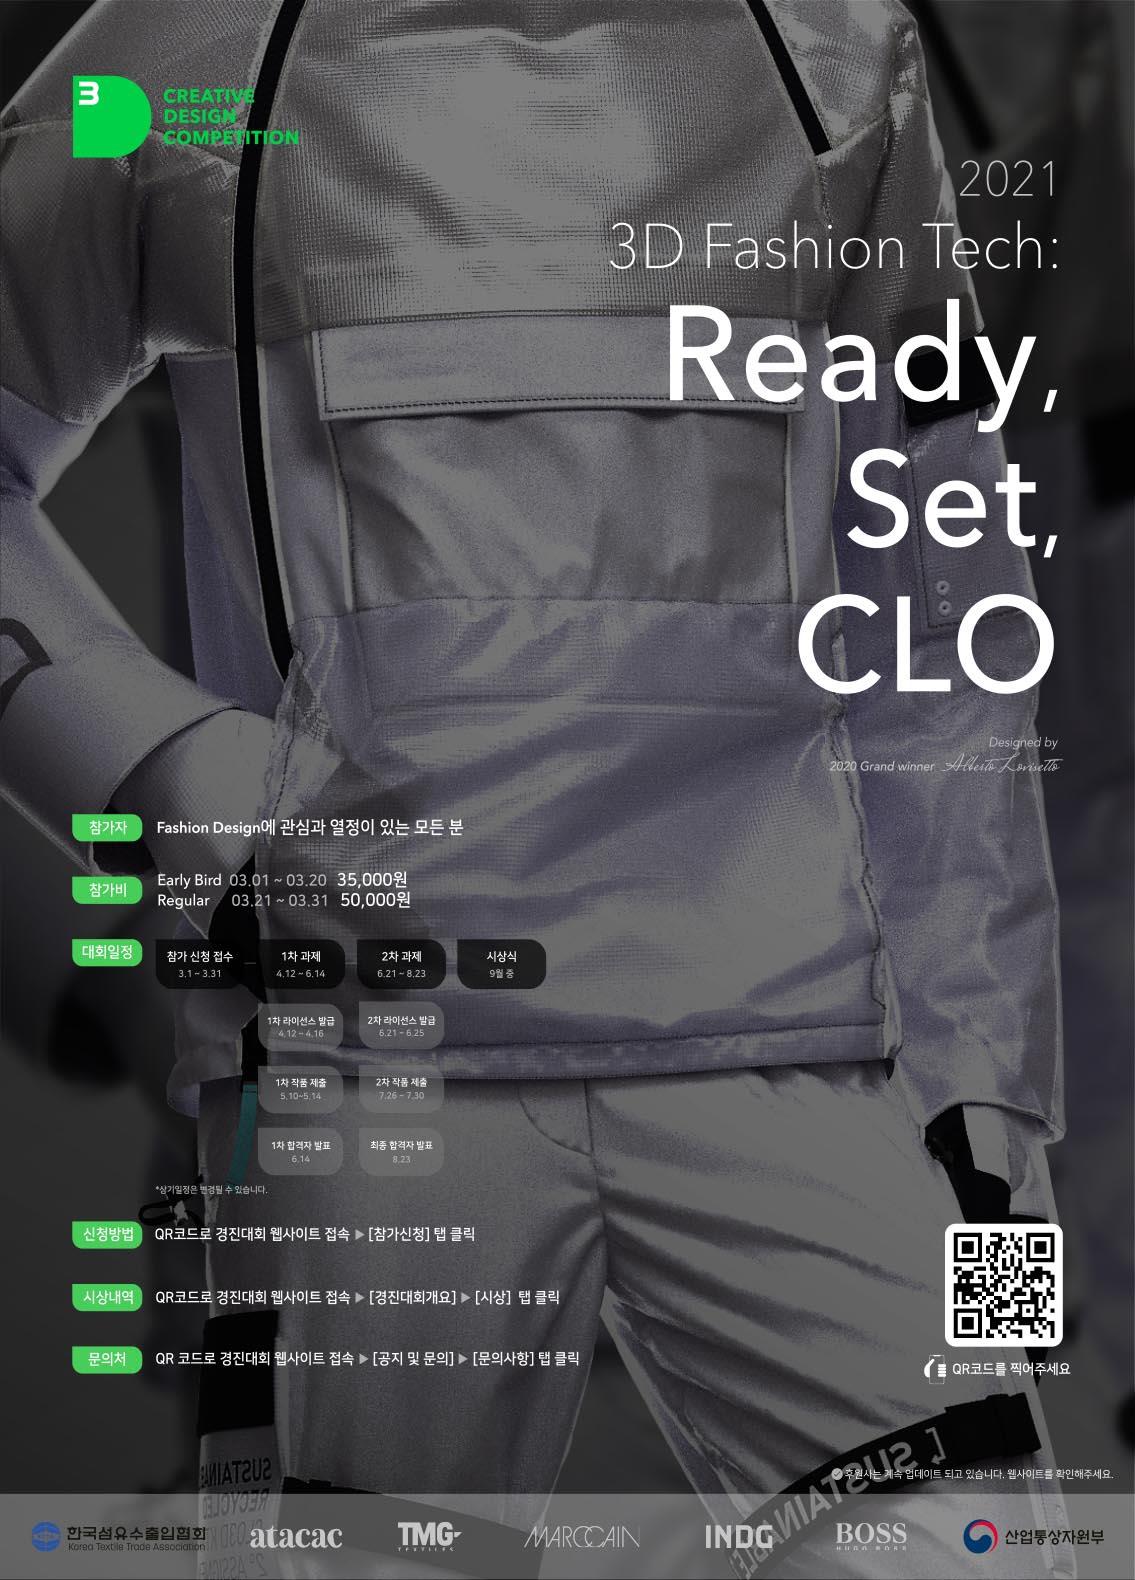 [KTTA]제 3회 3D Creative Design Competition 디자인 경진대회 공모전(3/1~3/31)